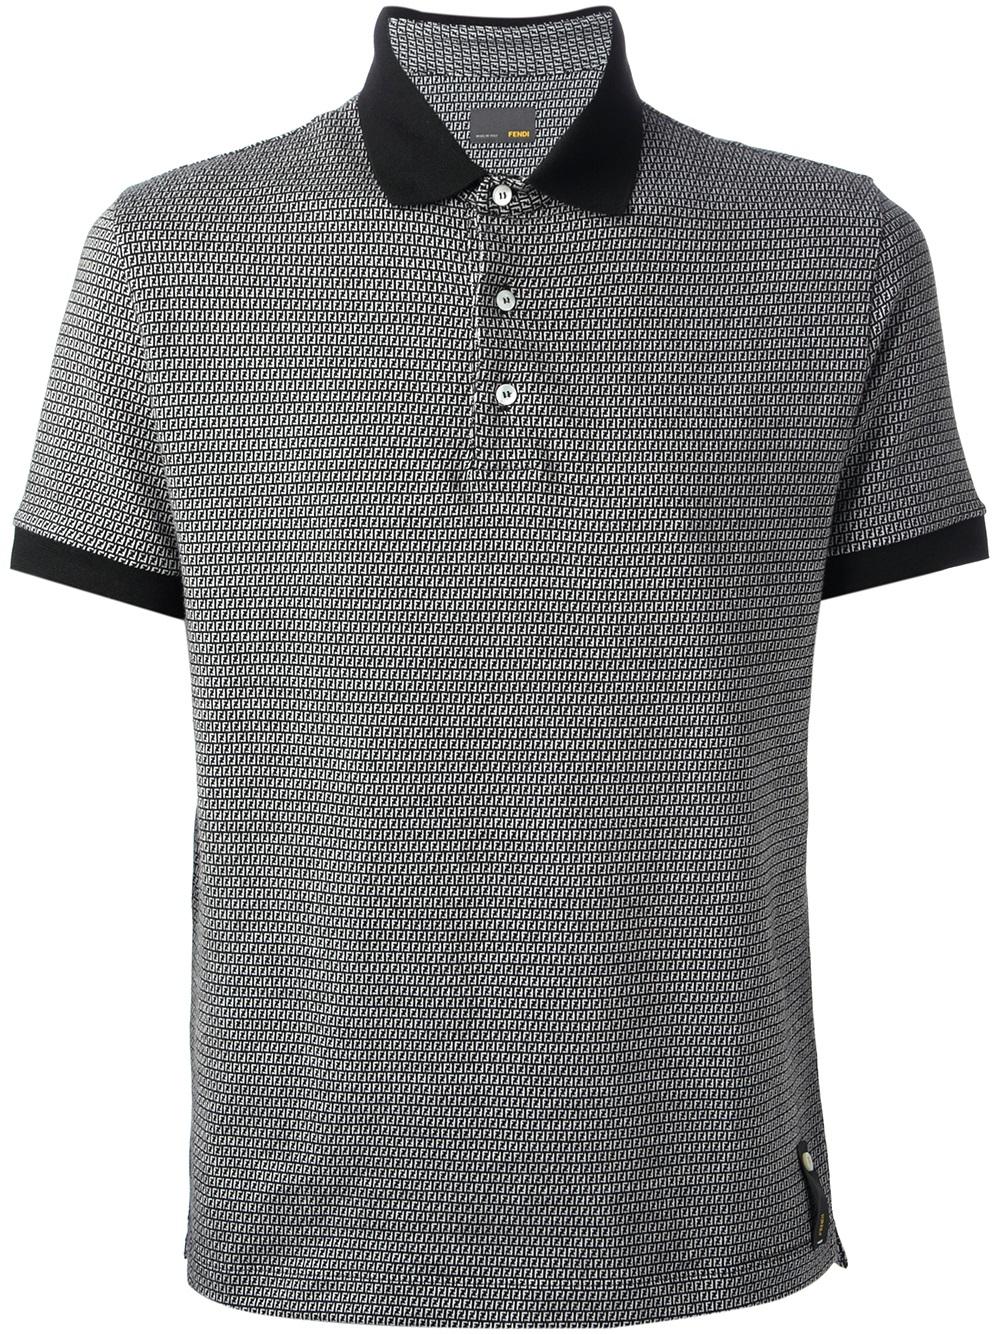 67330bfac82 Lyst - Fendi Monogram Print Polo Shirt in Black for Men